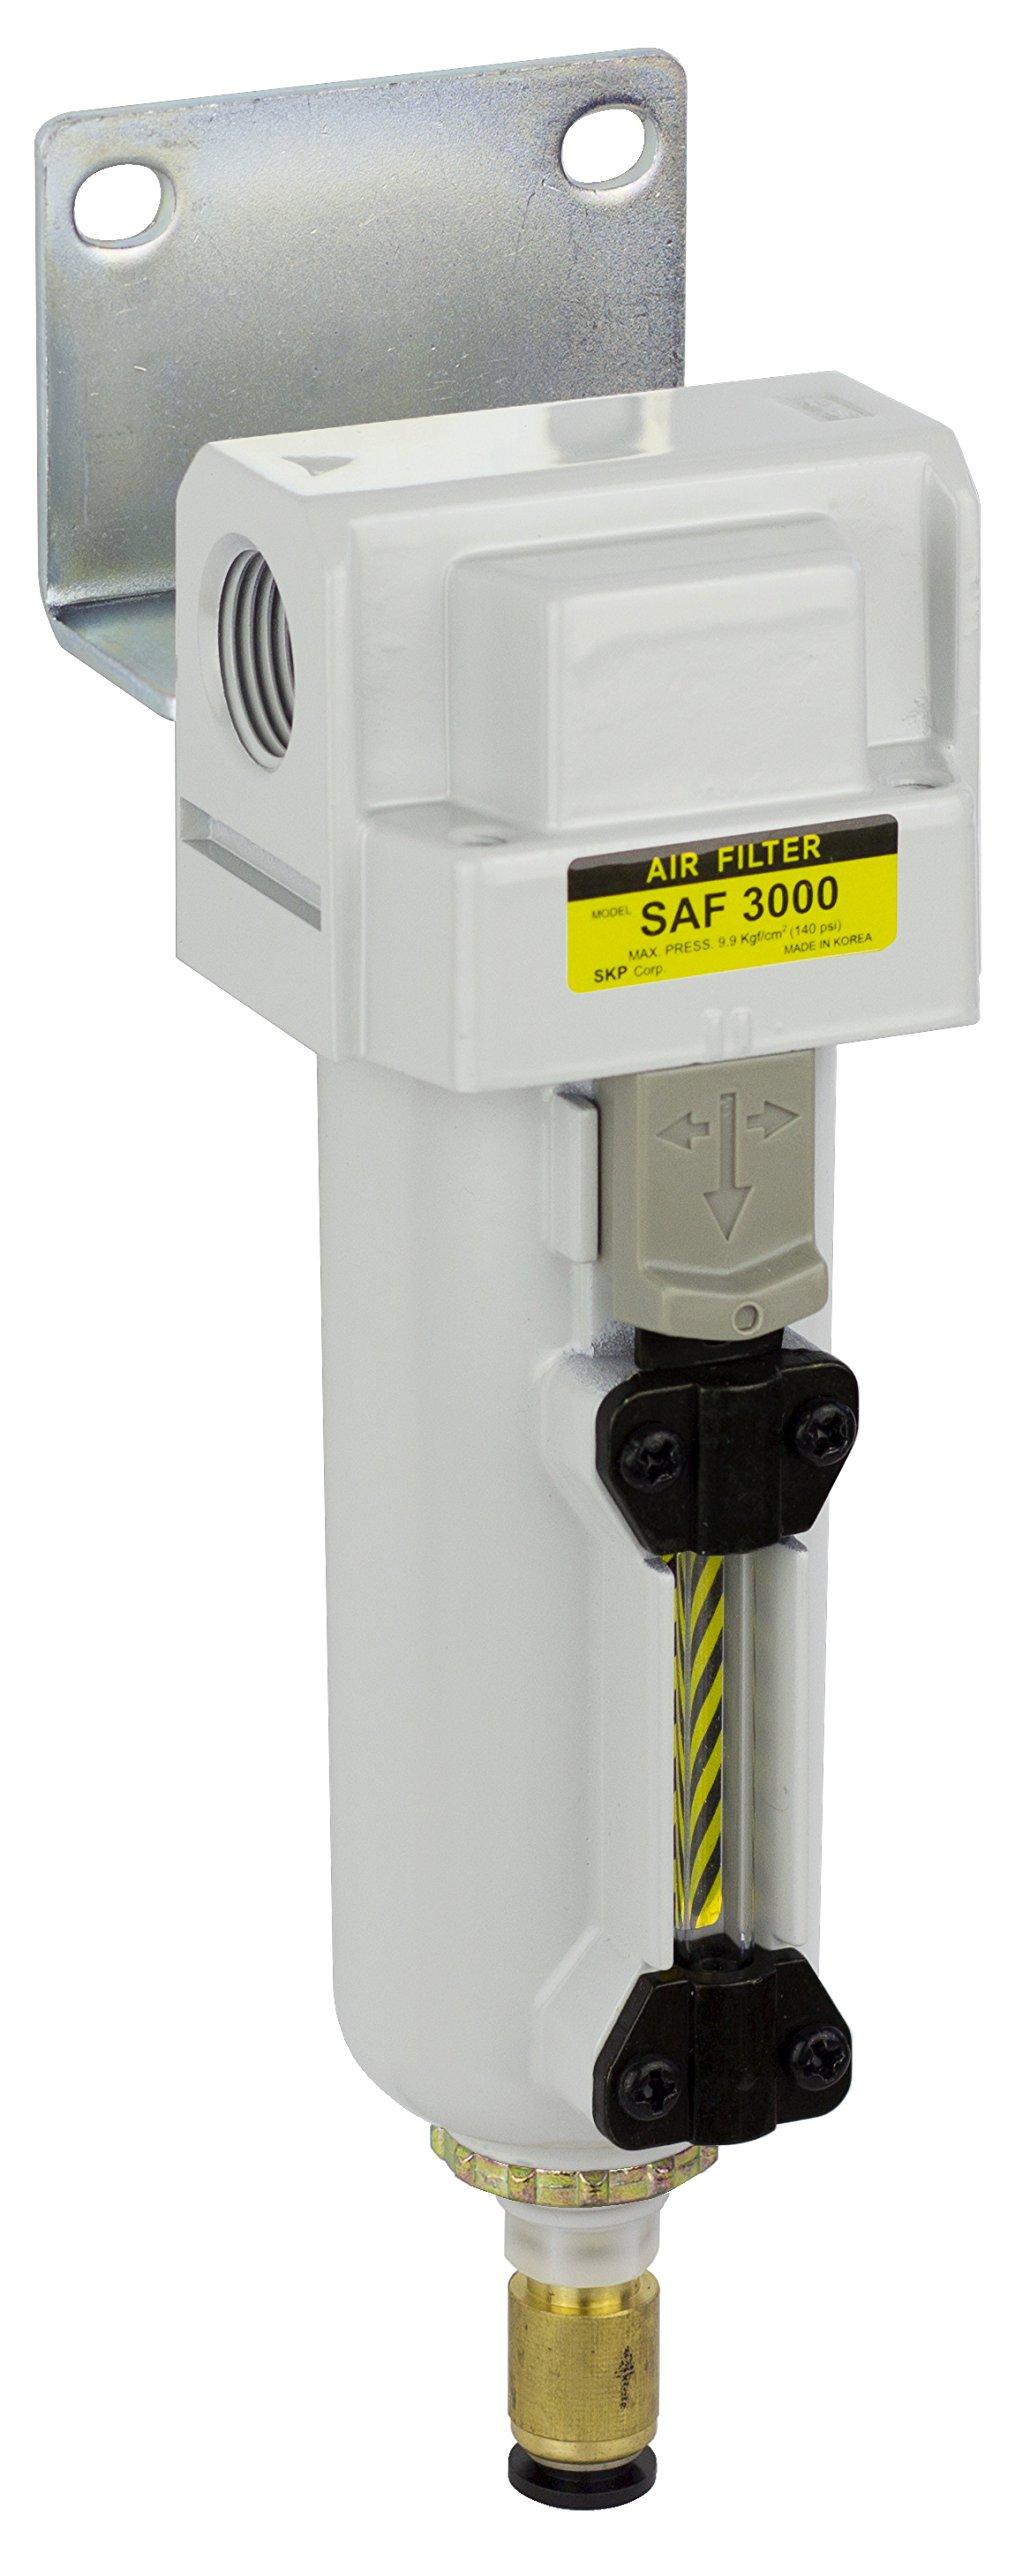 PneumaticPlus SAF3000M-N03BD-MEP Compressed Air Particulate Filter, 3/8'' Pipe Size, NPT-Auto Drain, Metal Bowl, 10 μm